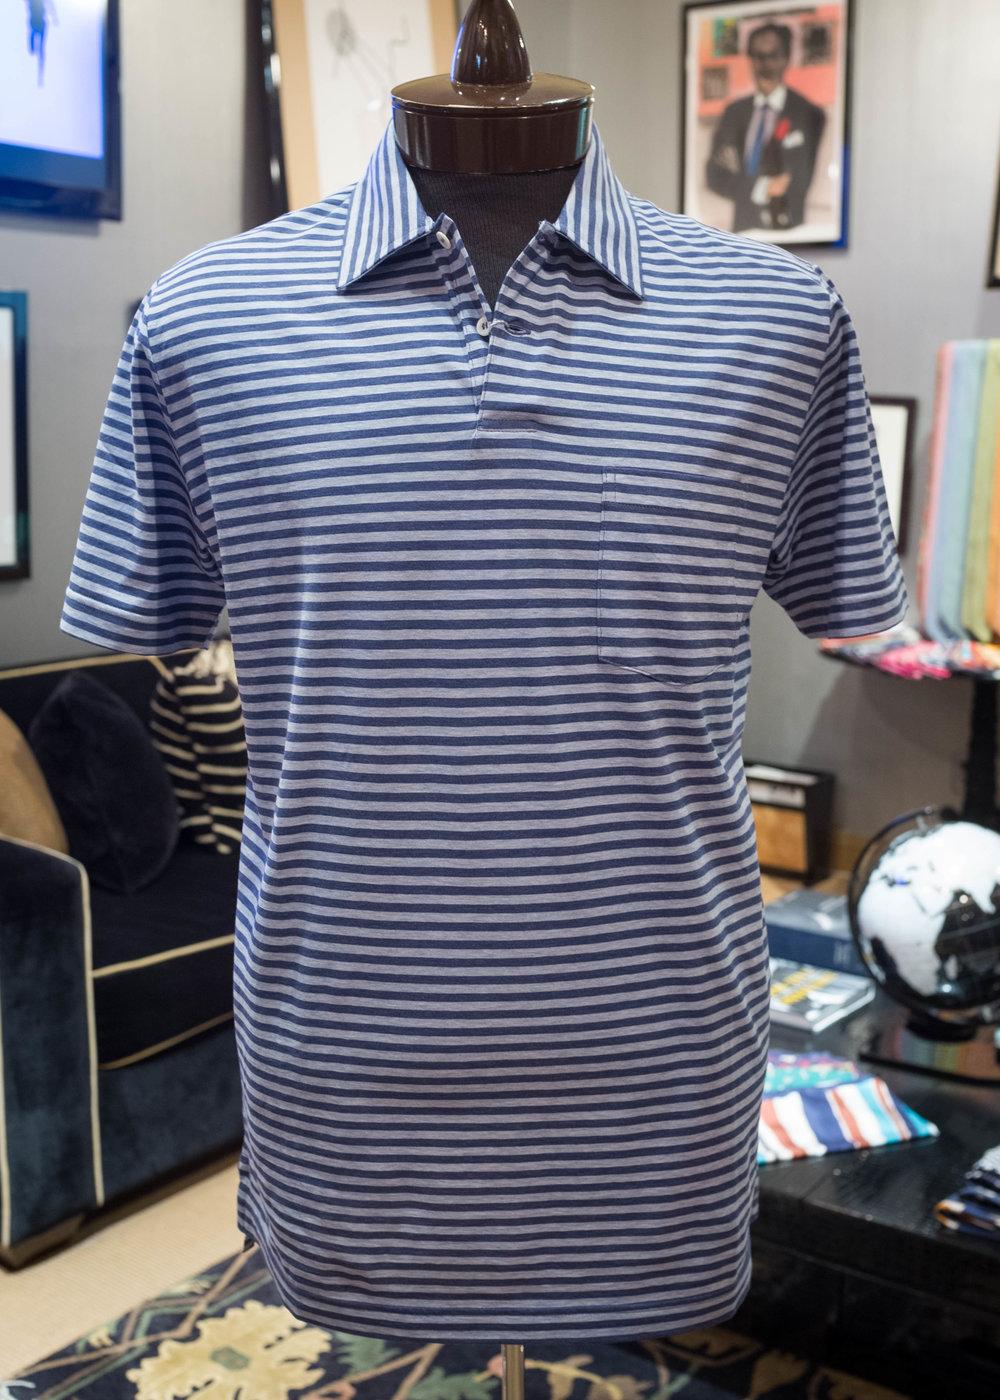 Indigo/grey horizontal striped cotton jersey